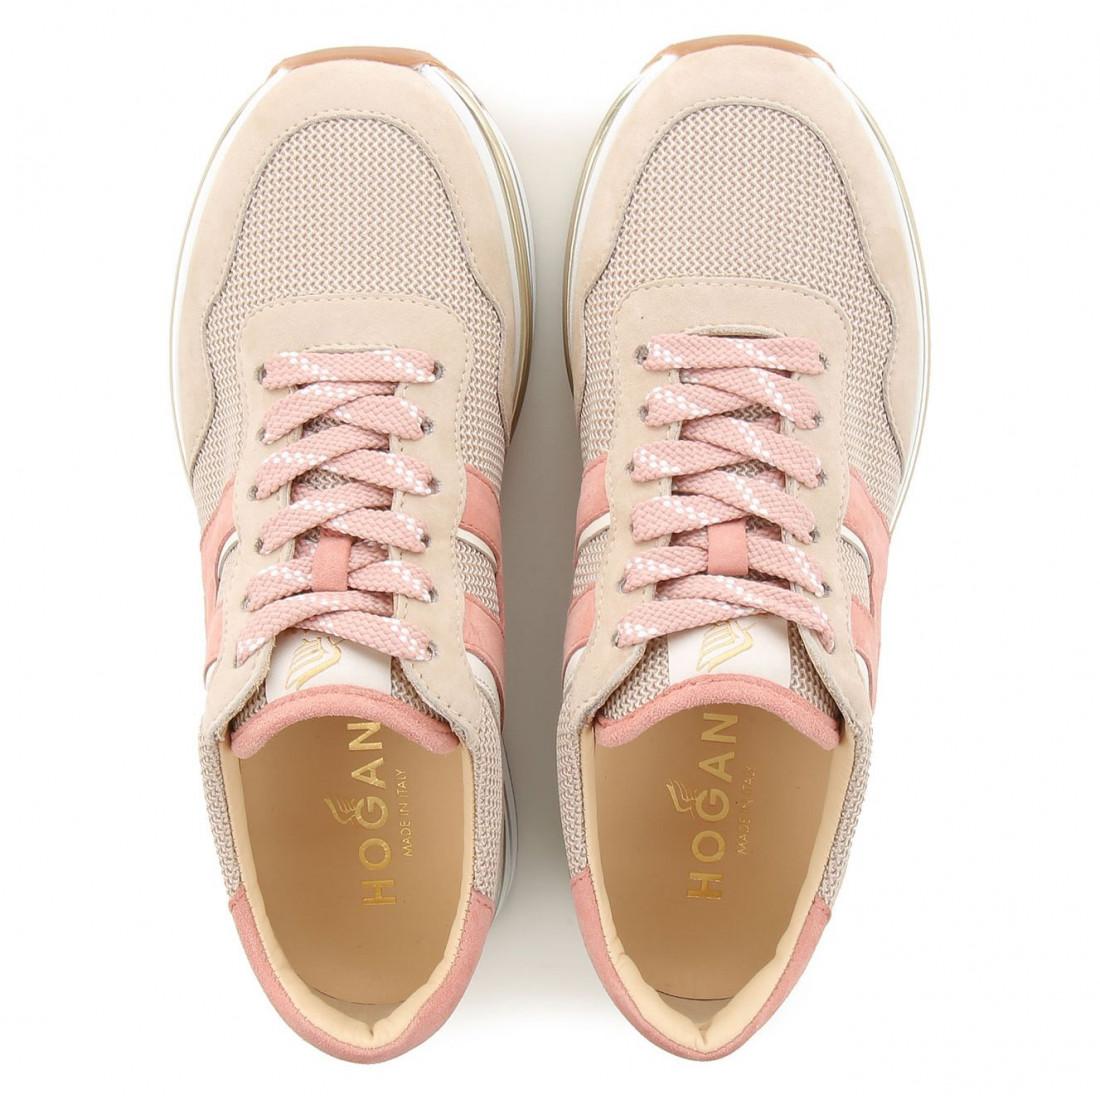 Sneaker Hogan Midi H222 in pink - beige suede and fabric